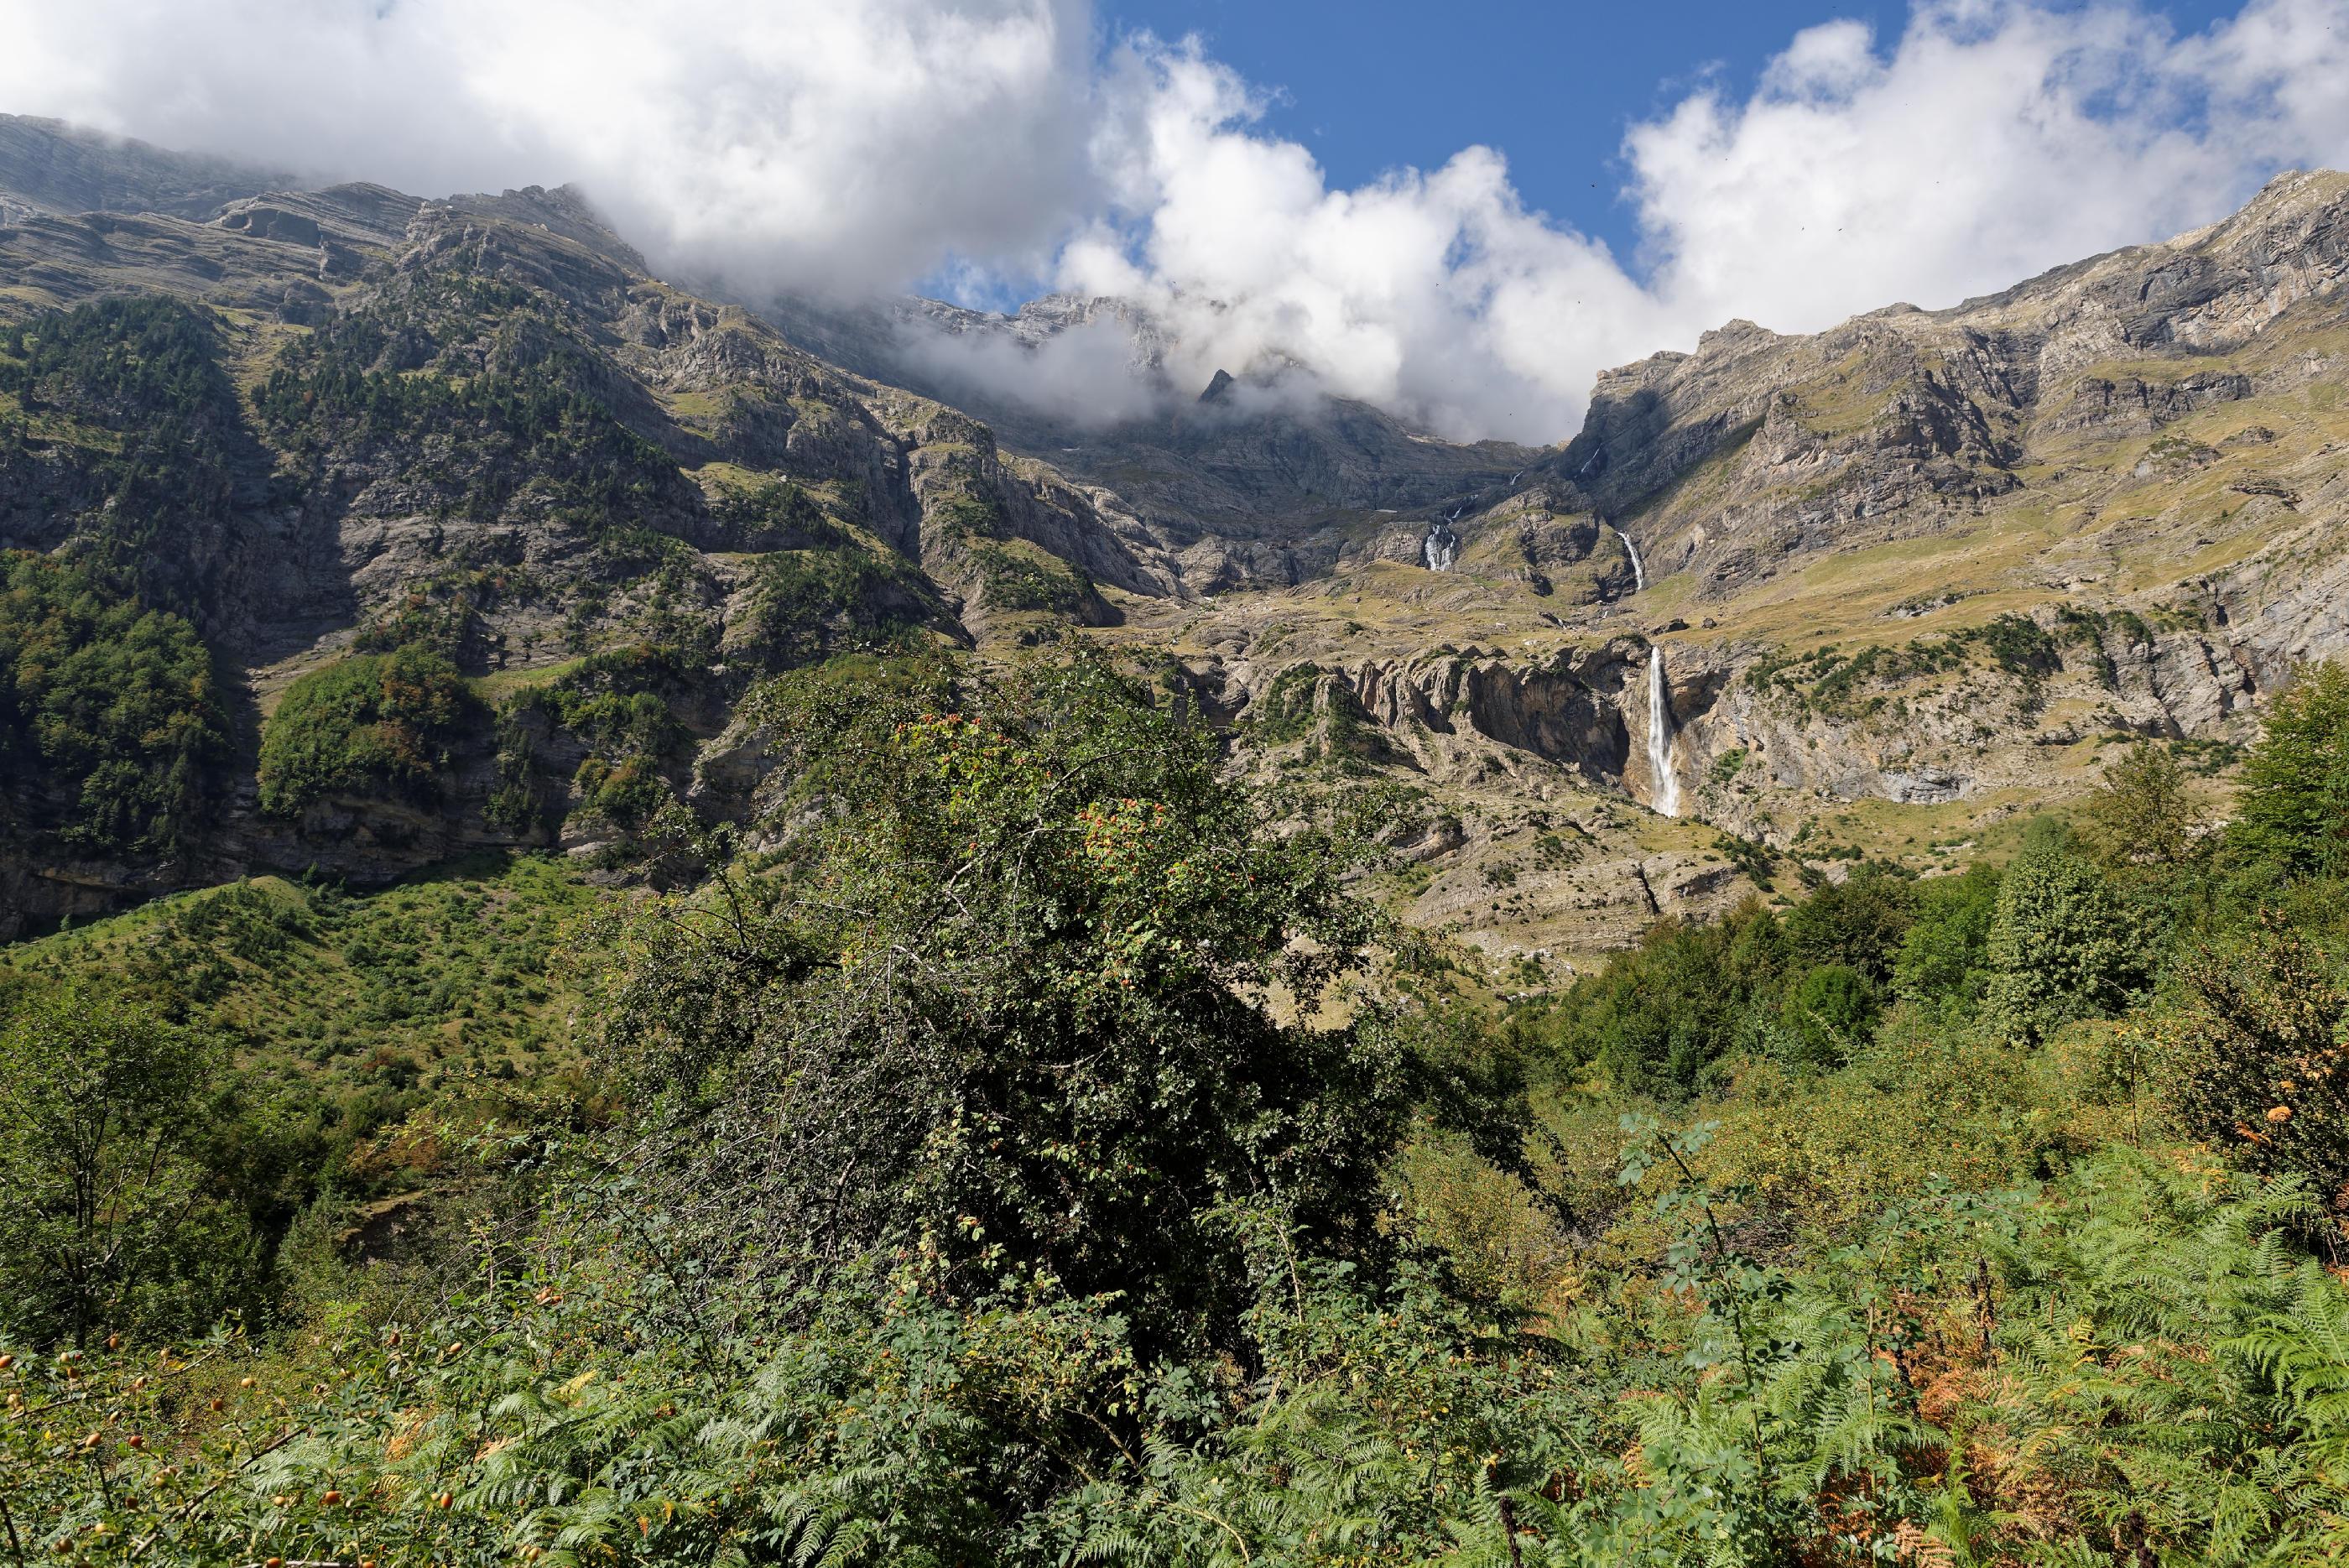 160910-marche-cascade-du-cinca-et-de-la-larri-sobrarbe-aragon-111